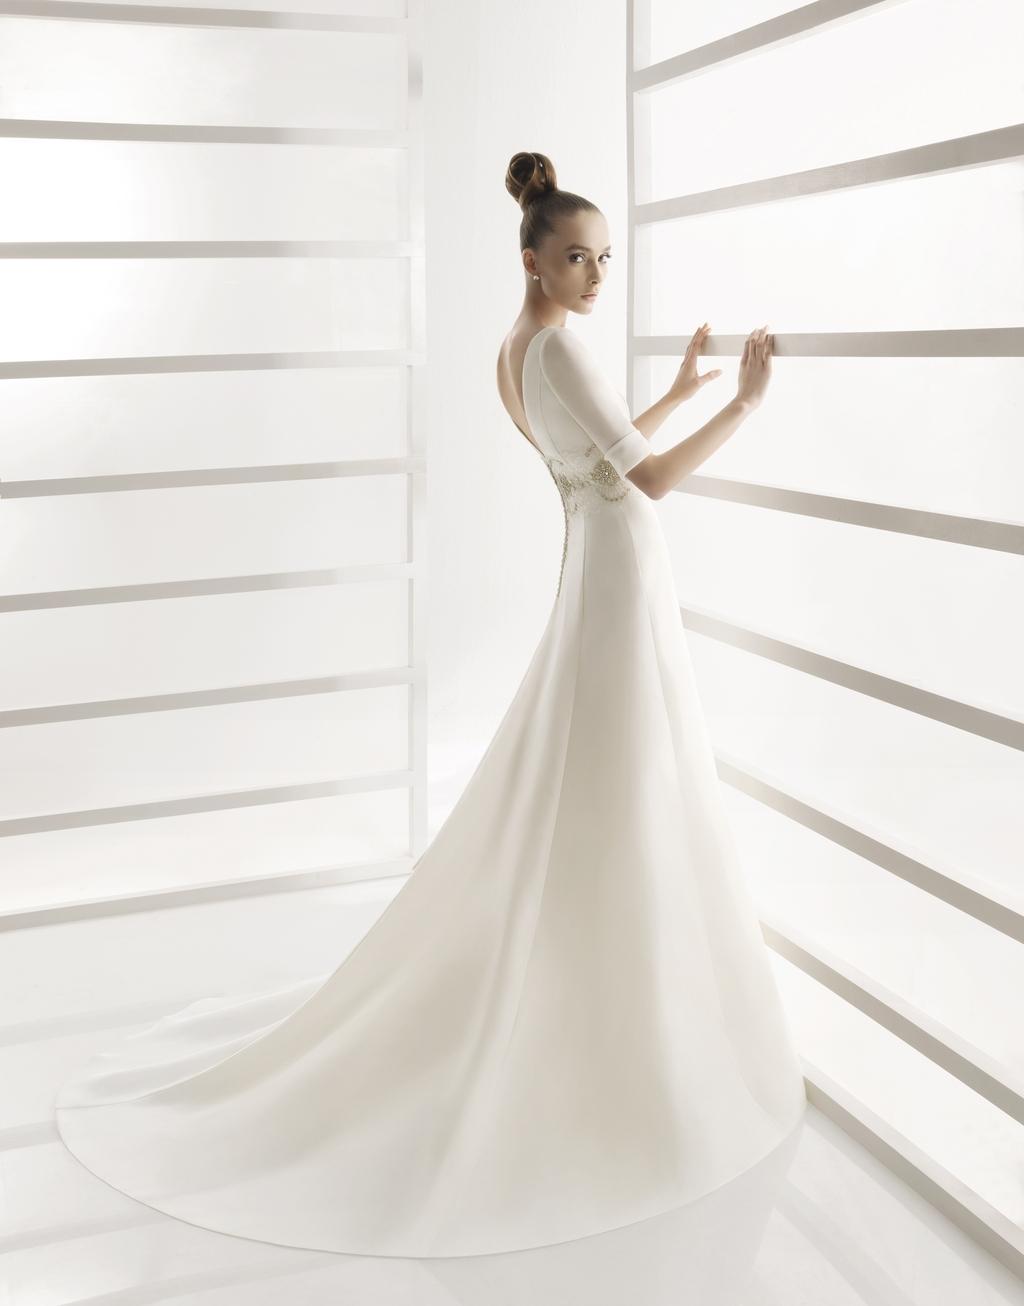 Quarter Length Wedding Dresses with Sleeves